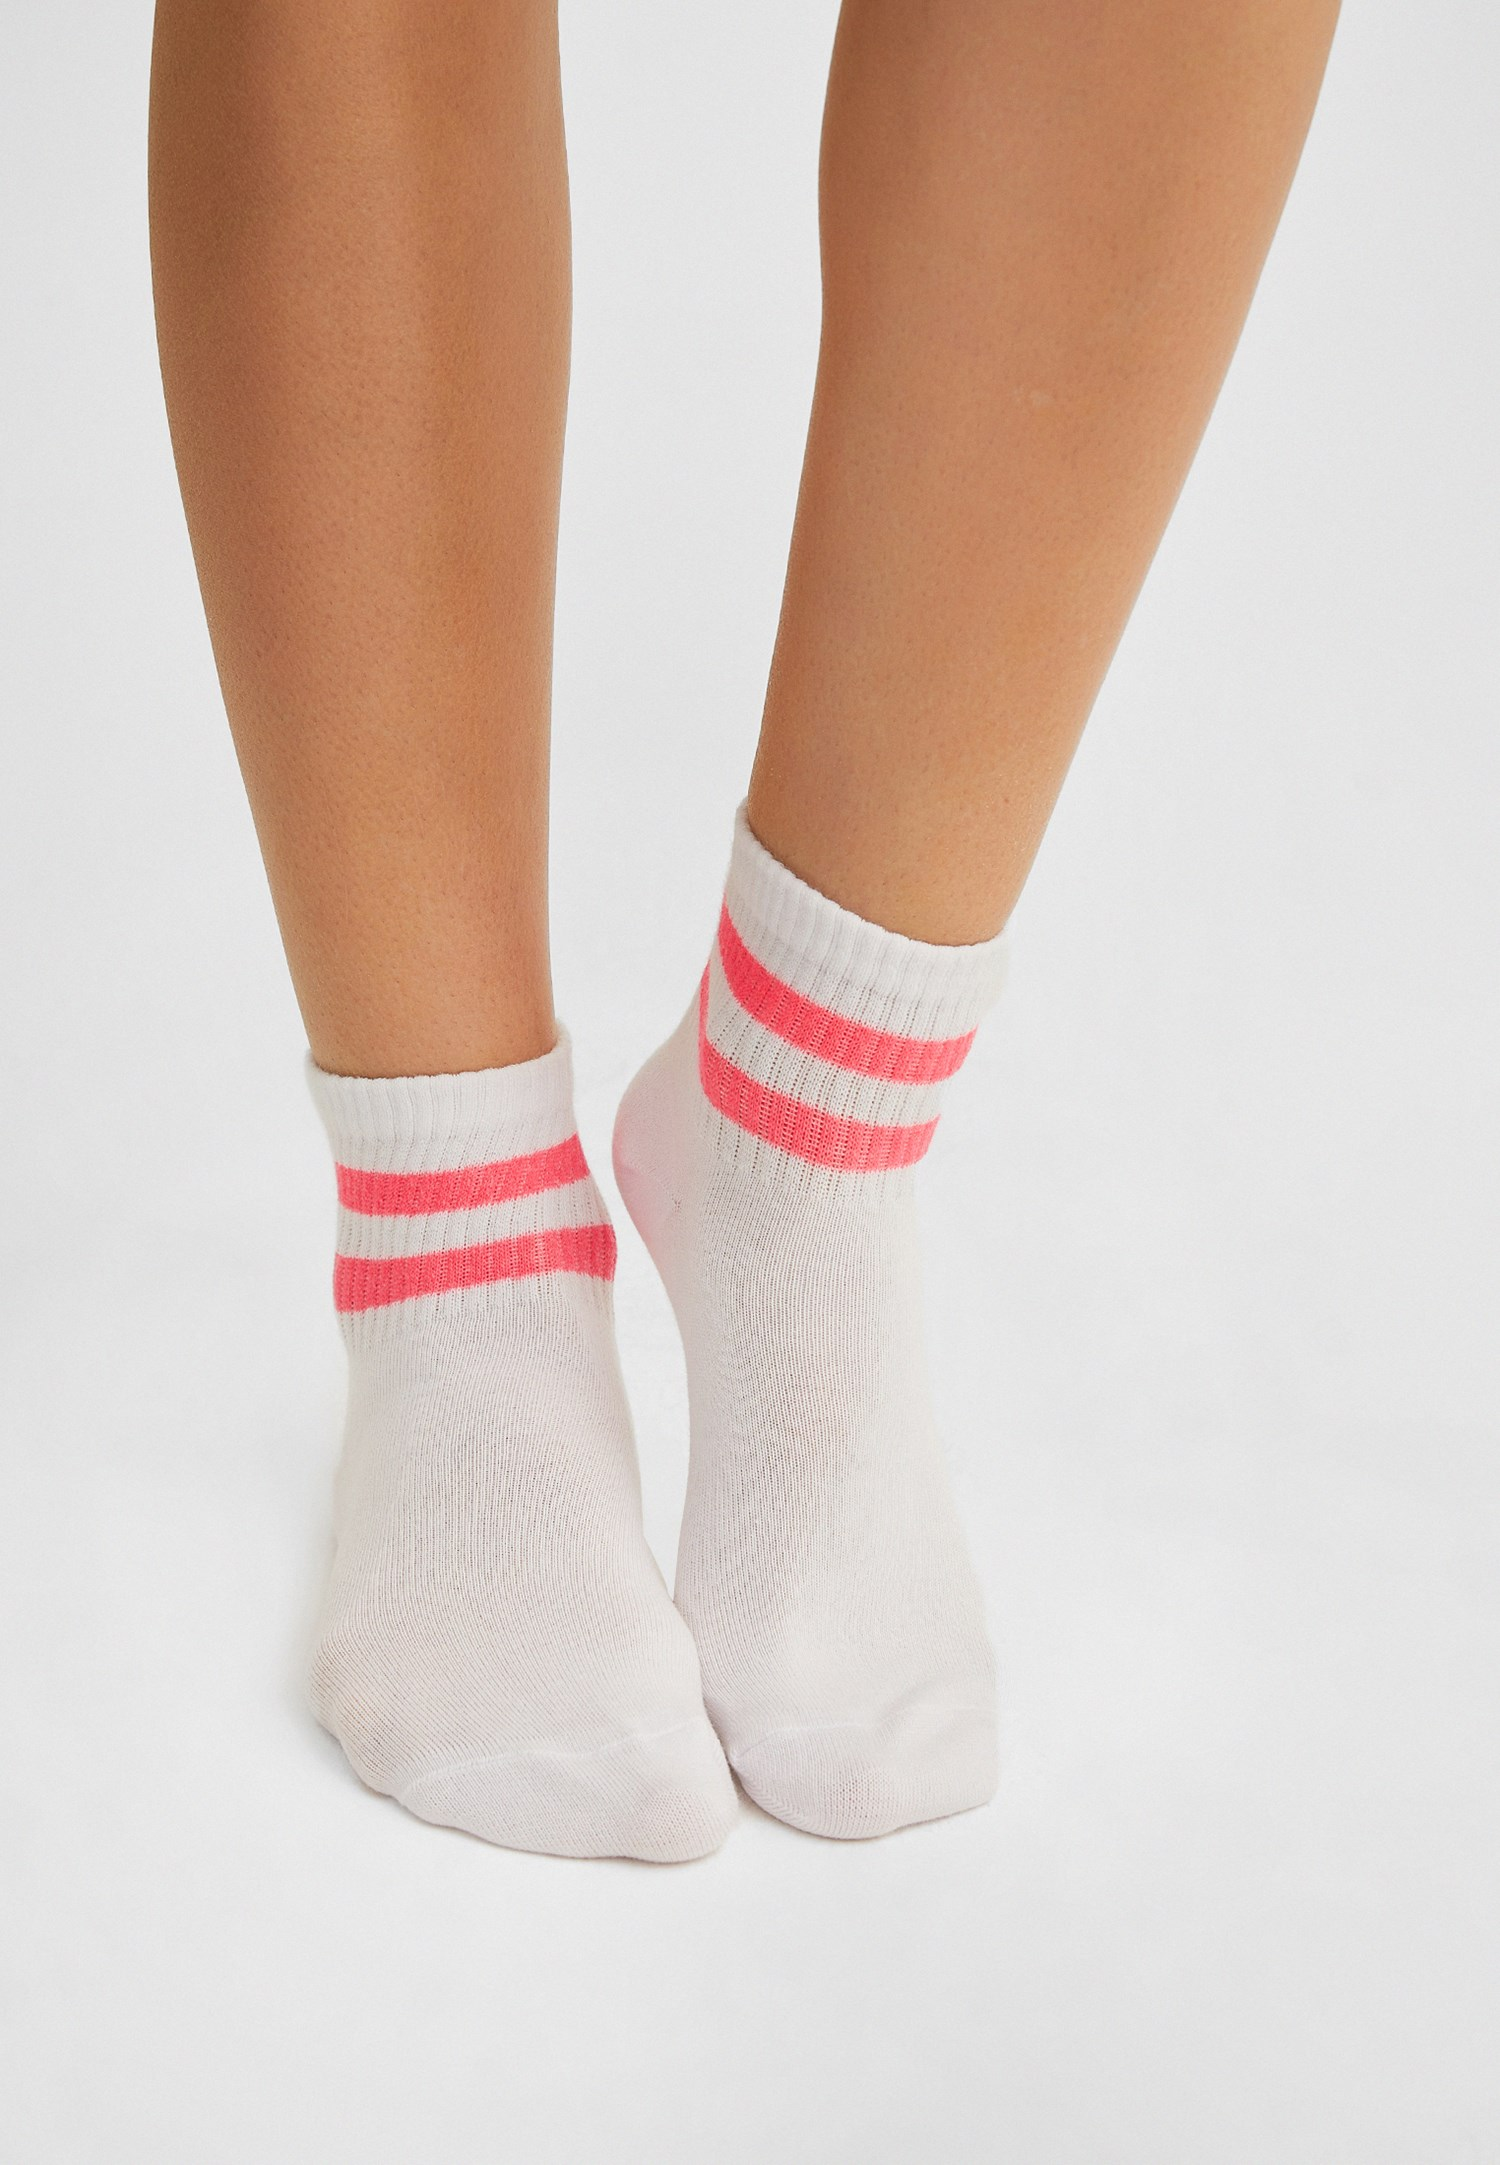 Bayan Pembe Çizgili Çorap